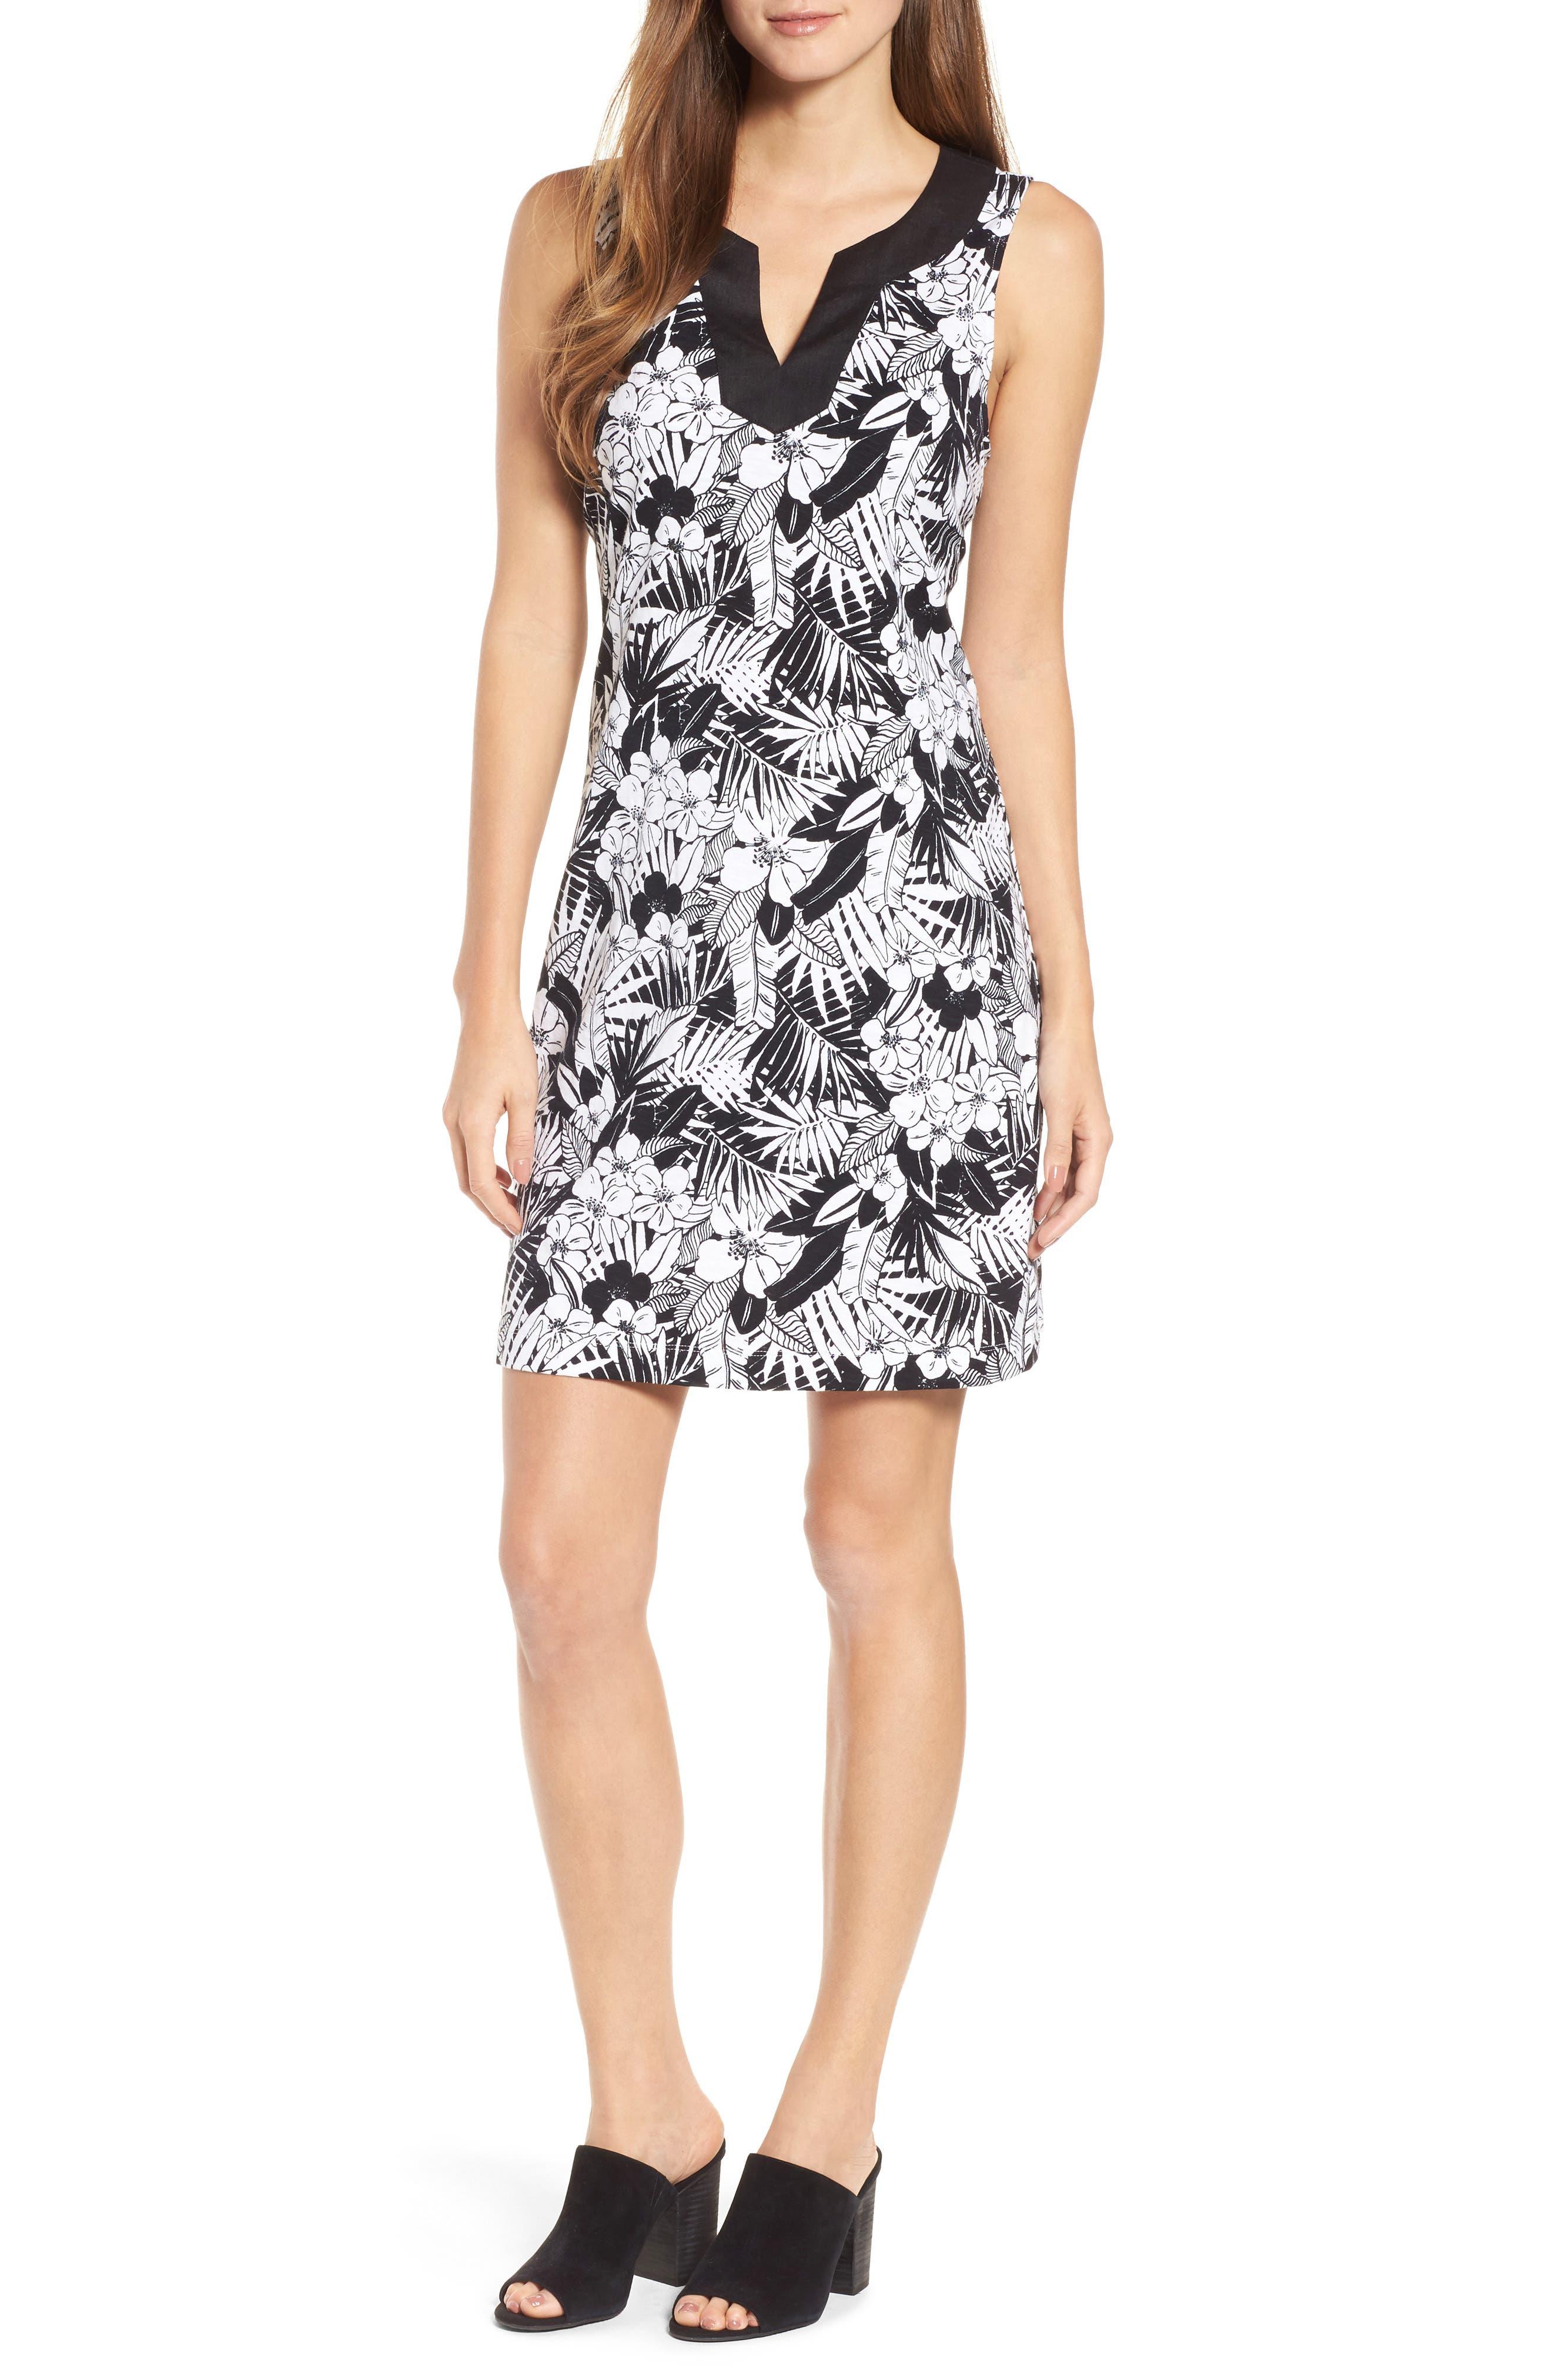 TOMMY BAHAMA,                             Palm Noir Sleeveless Tunic Dress,                             Main thumbnail 1, color,                             001